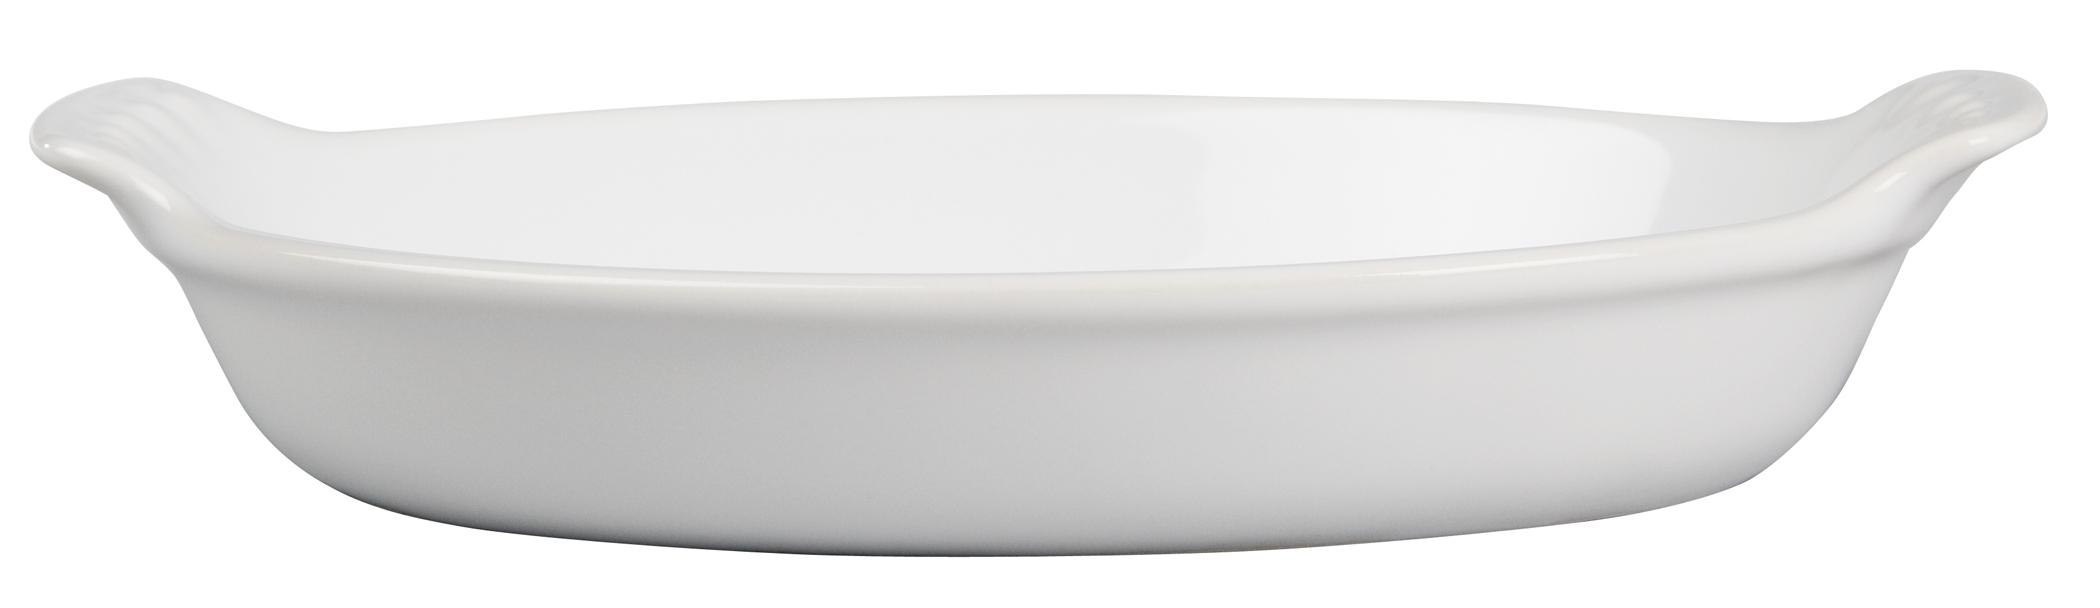 Le Creuset Heritage White Stoneware Petite Au Gratin Dish, 6 Ounce